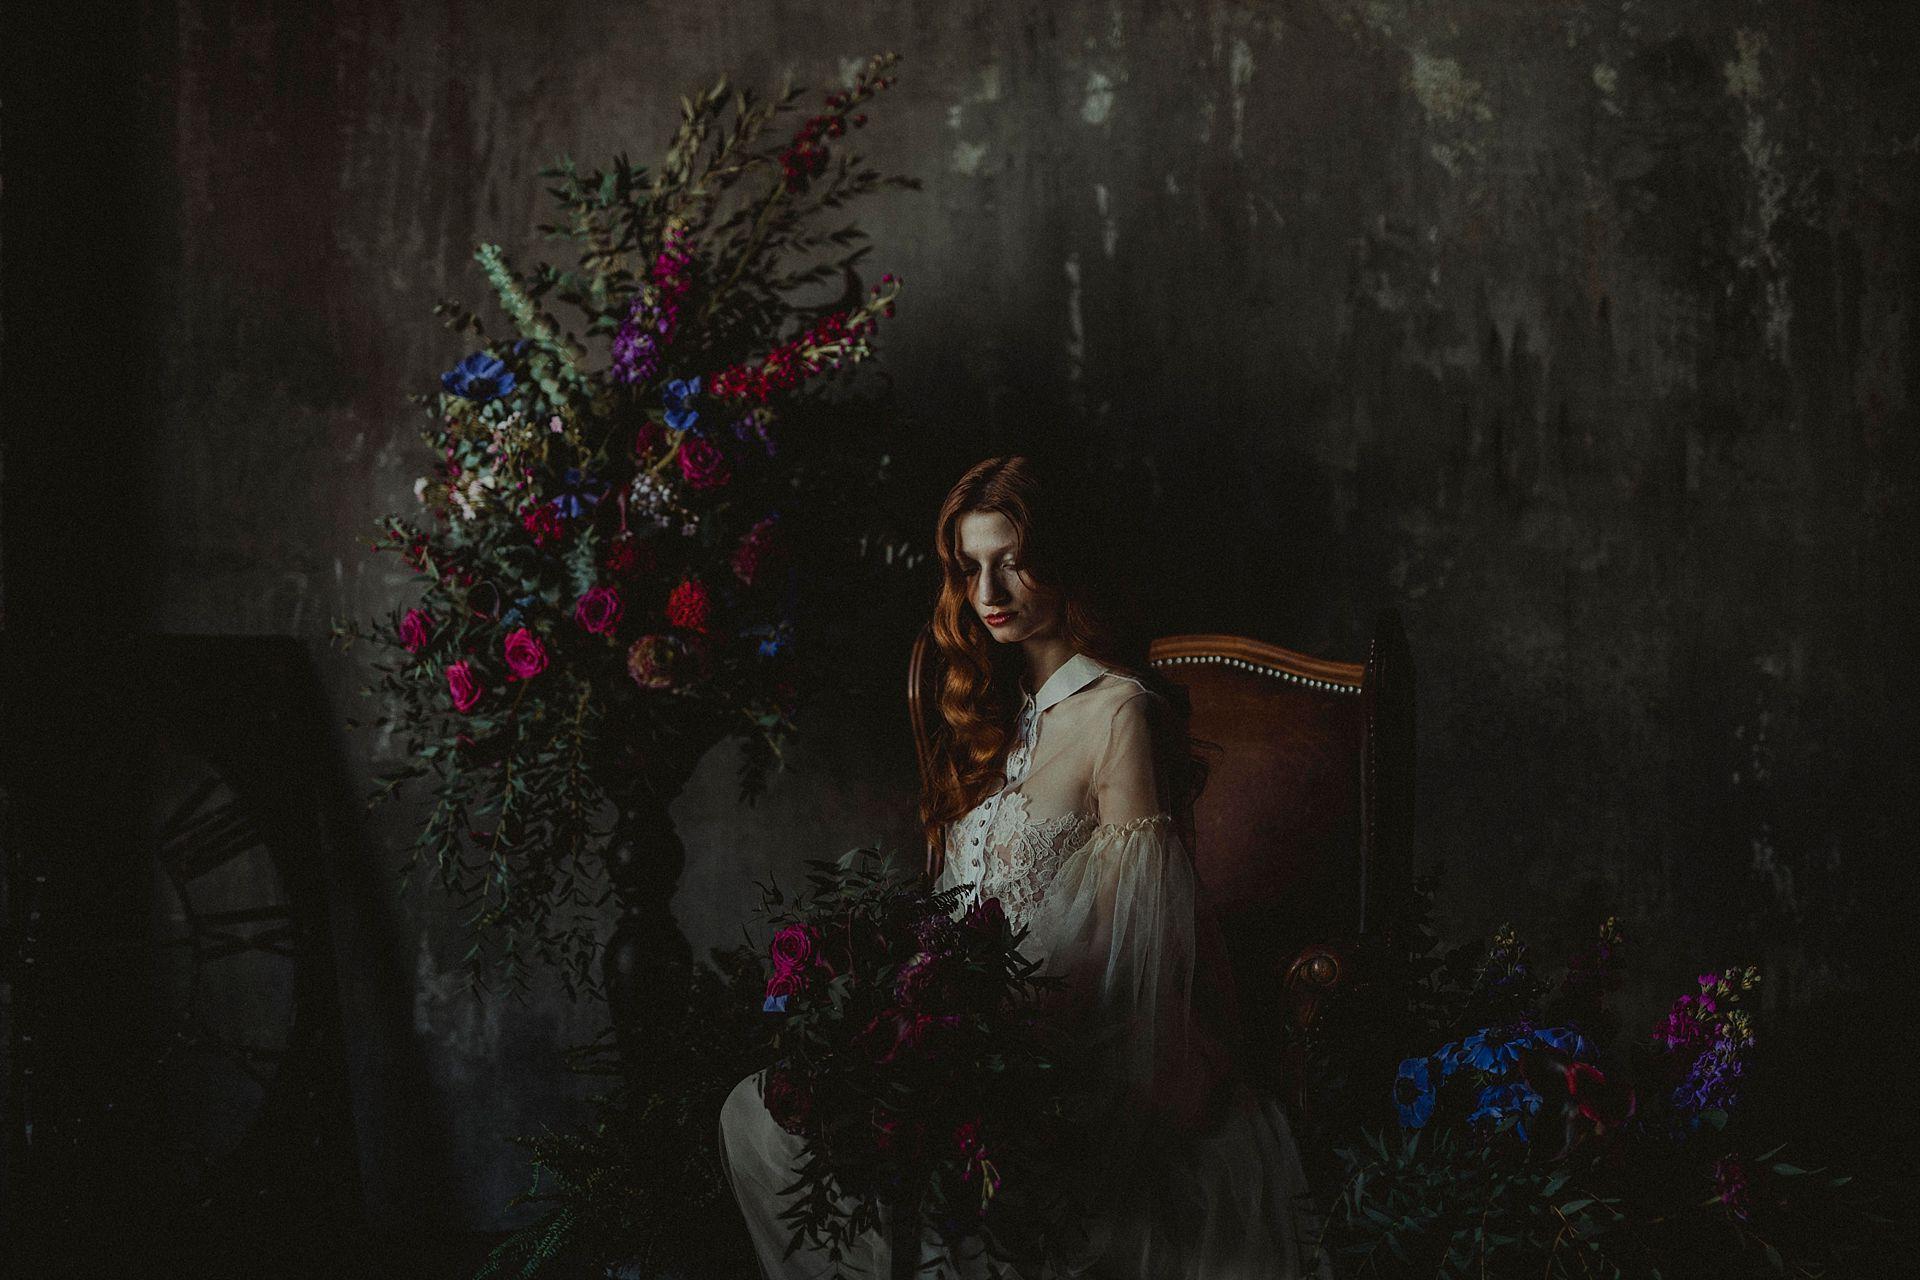 Decadent Wedding Inspiration- Moody Wedding Inspiration- Sudio Fotografico Bacci- Unconventional Wedding- unique wedding flowers- dark wedding photography